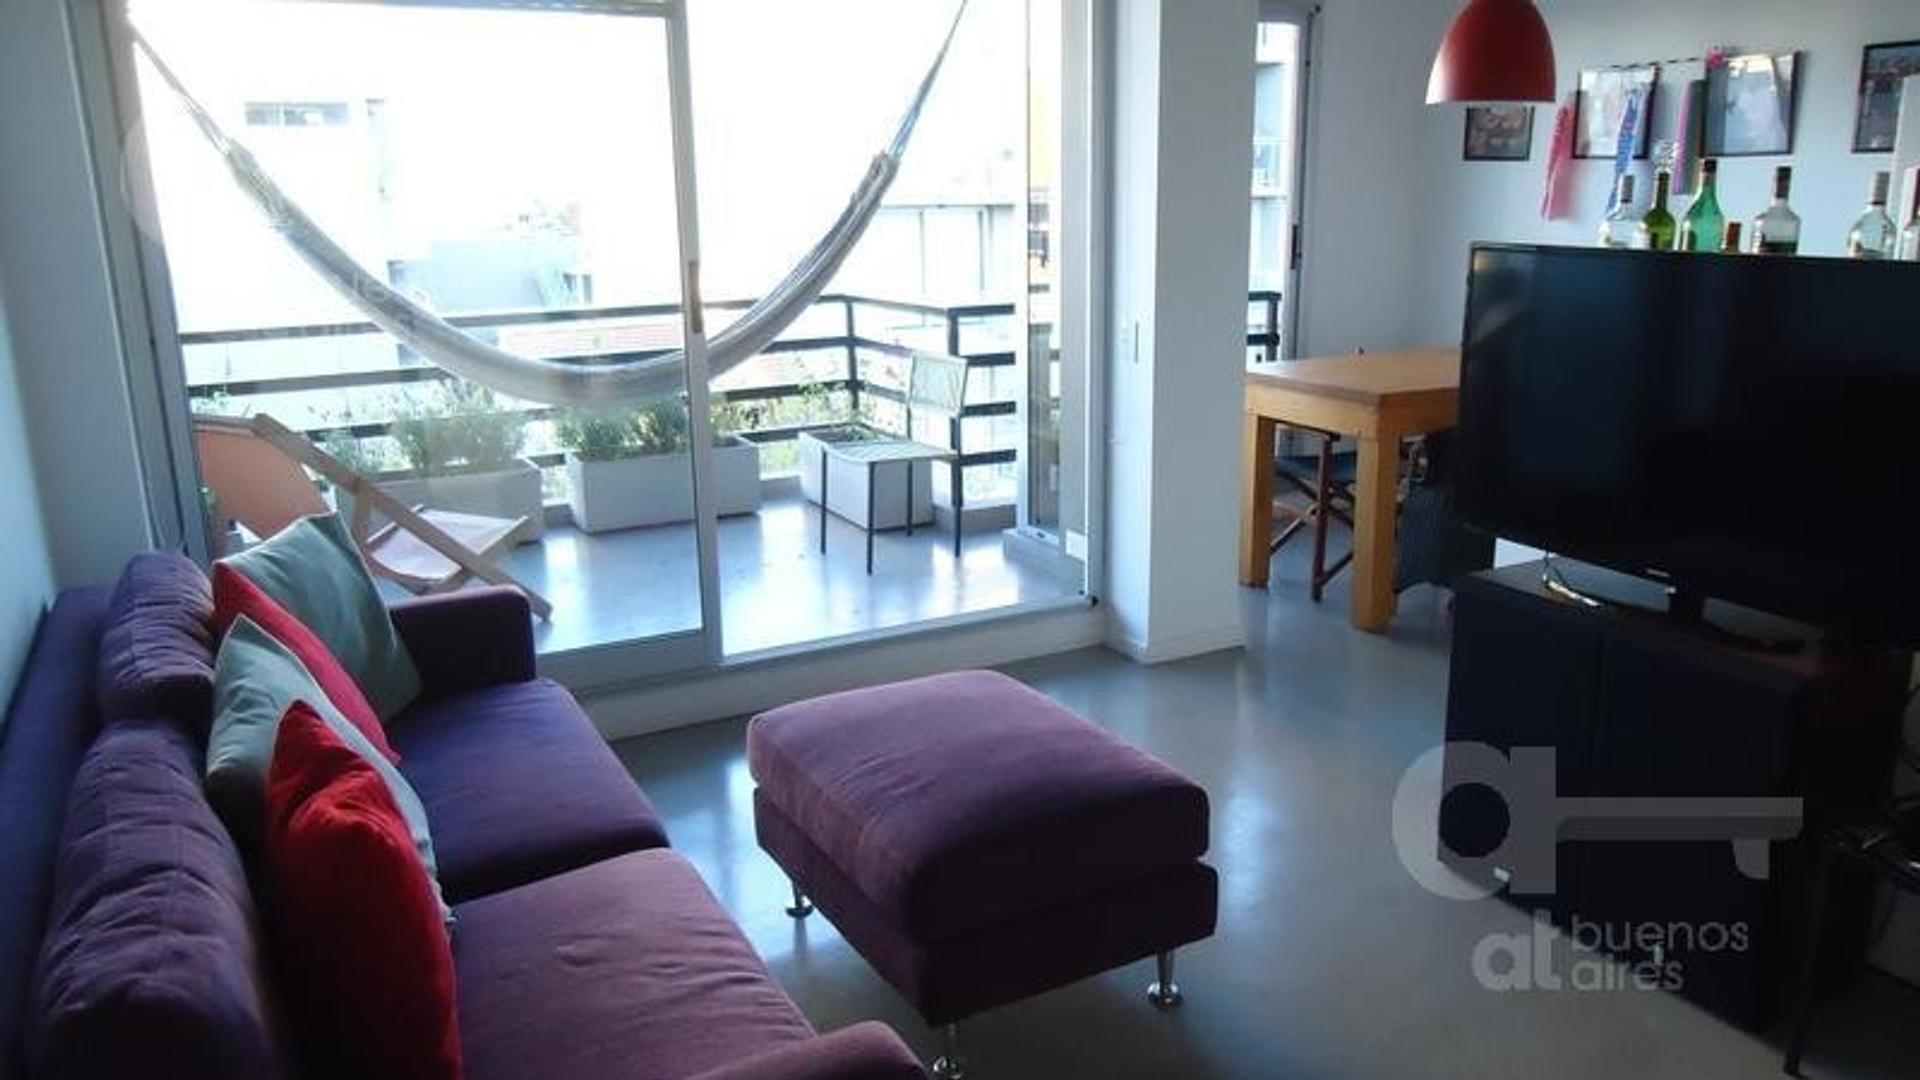 Villa Urquiza, Departamento 2 Ambientes con Balcón Terraza, Alquiler Temporario Sin Garantía!